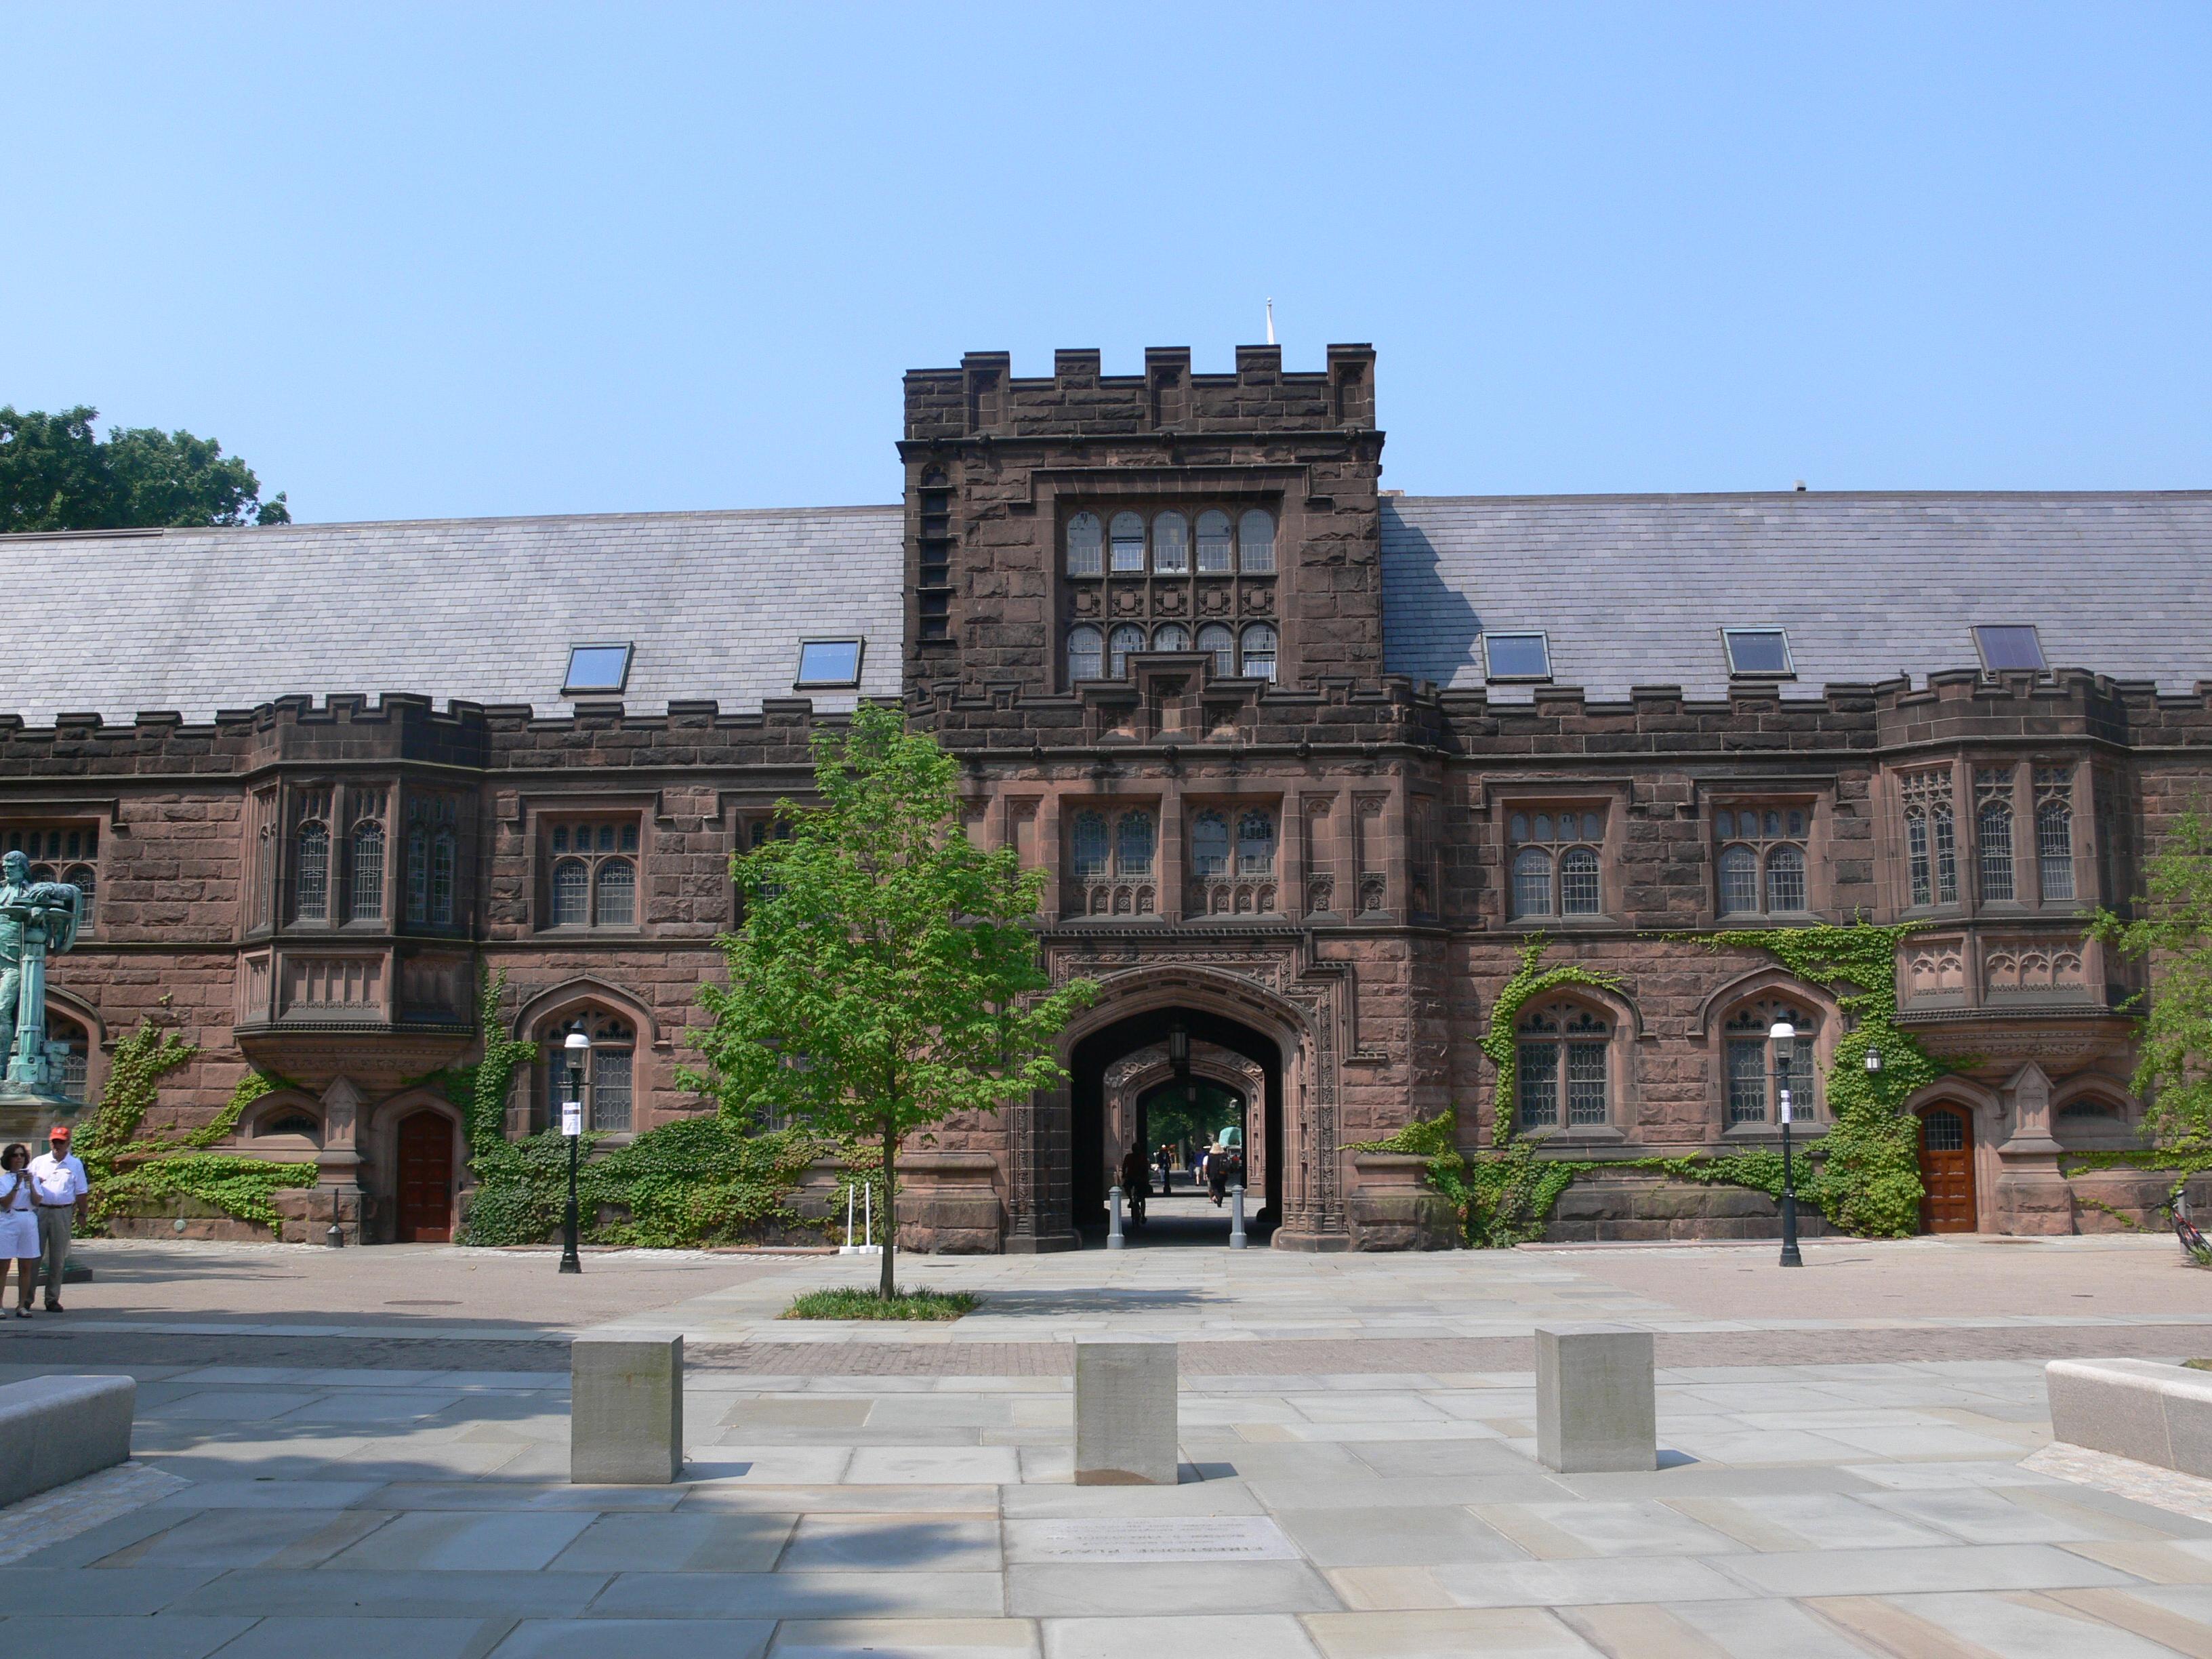 Kesadaran keadilan ras universitas - Princeton University